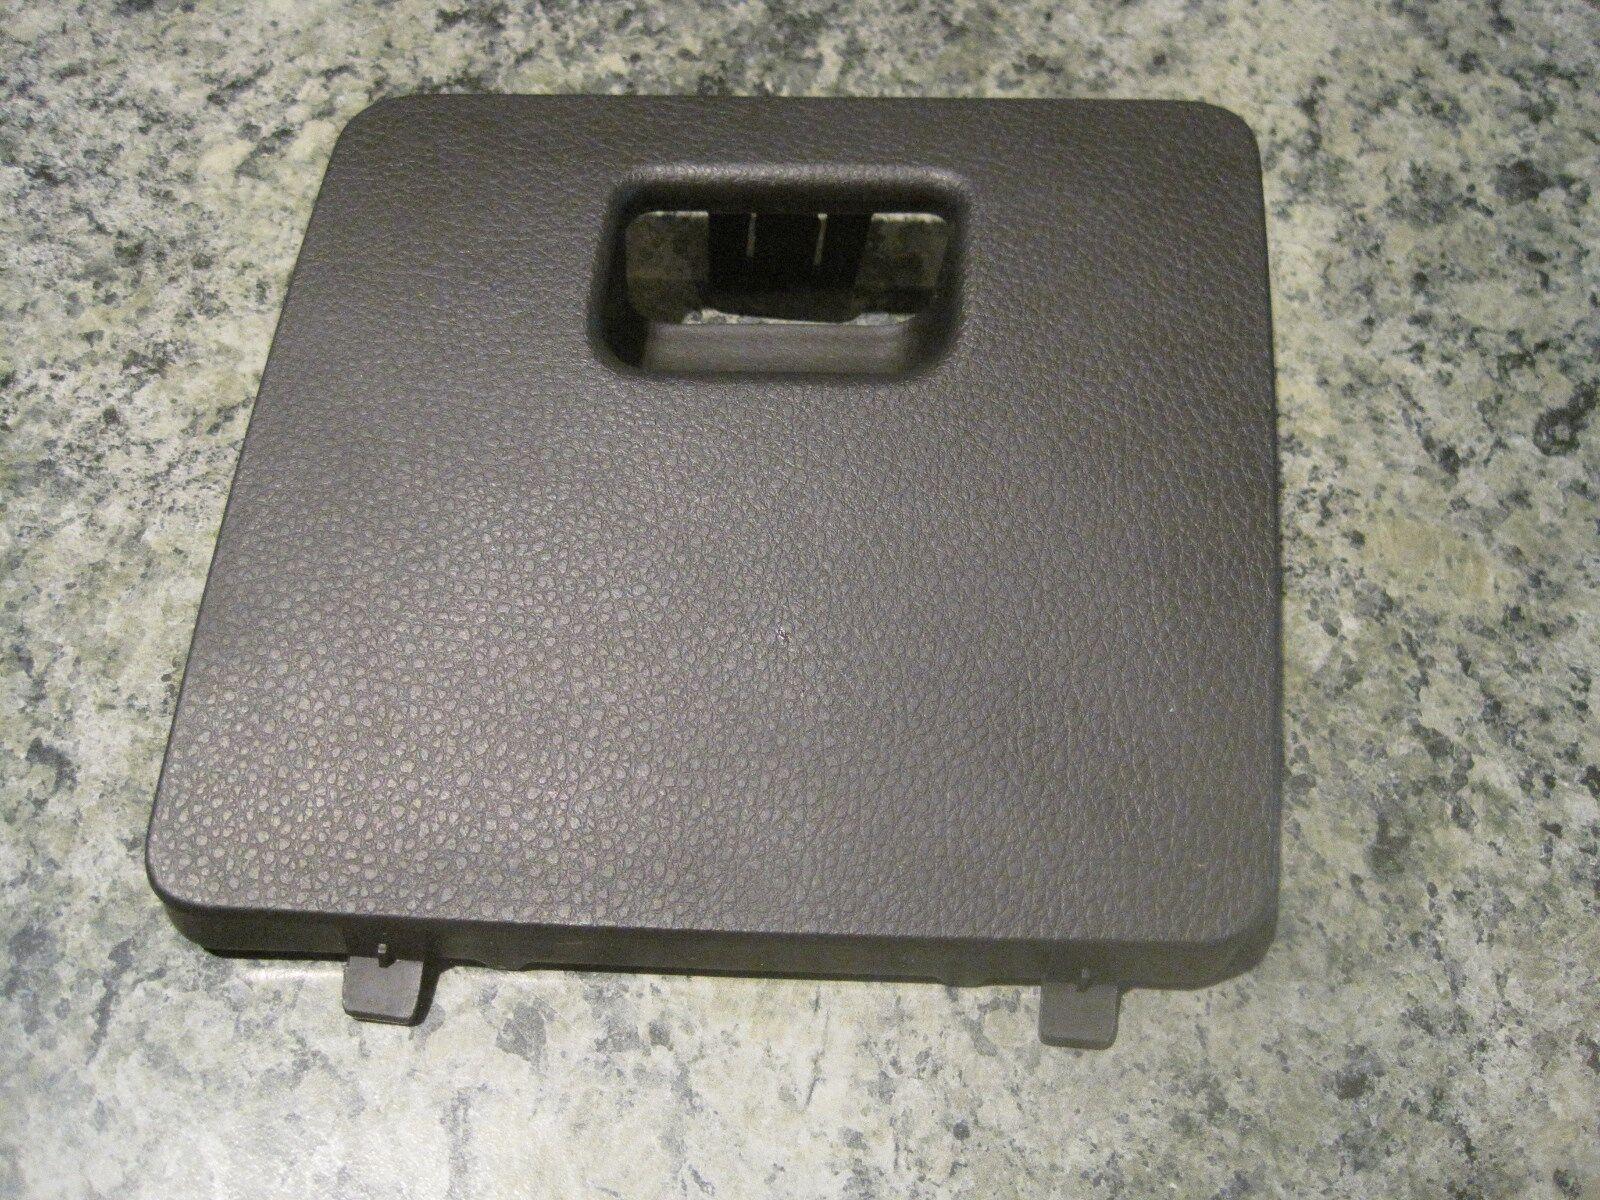 Used 2006 Nissan Maxima Dash Parts For Sale Fuse Box 2004 Interior Door Black